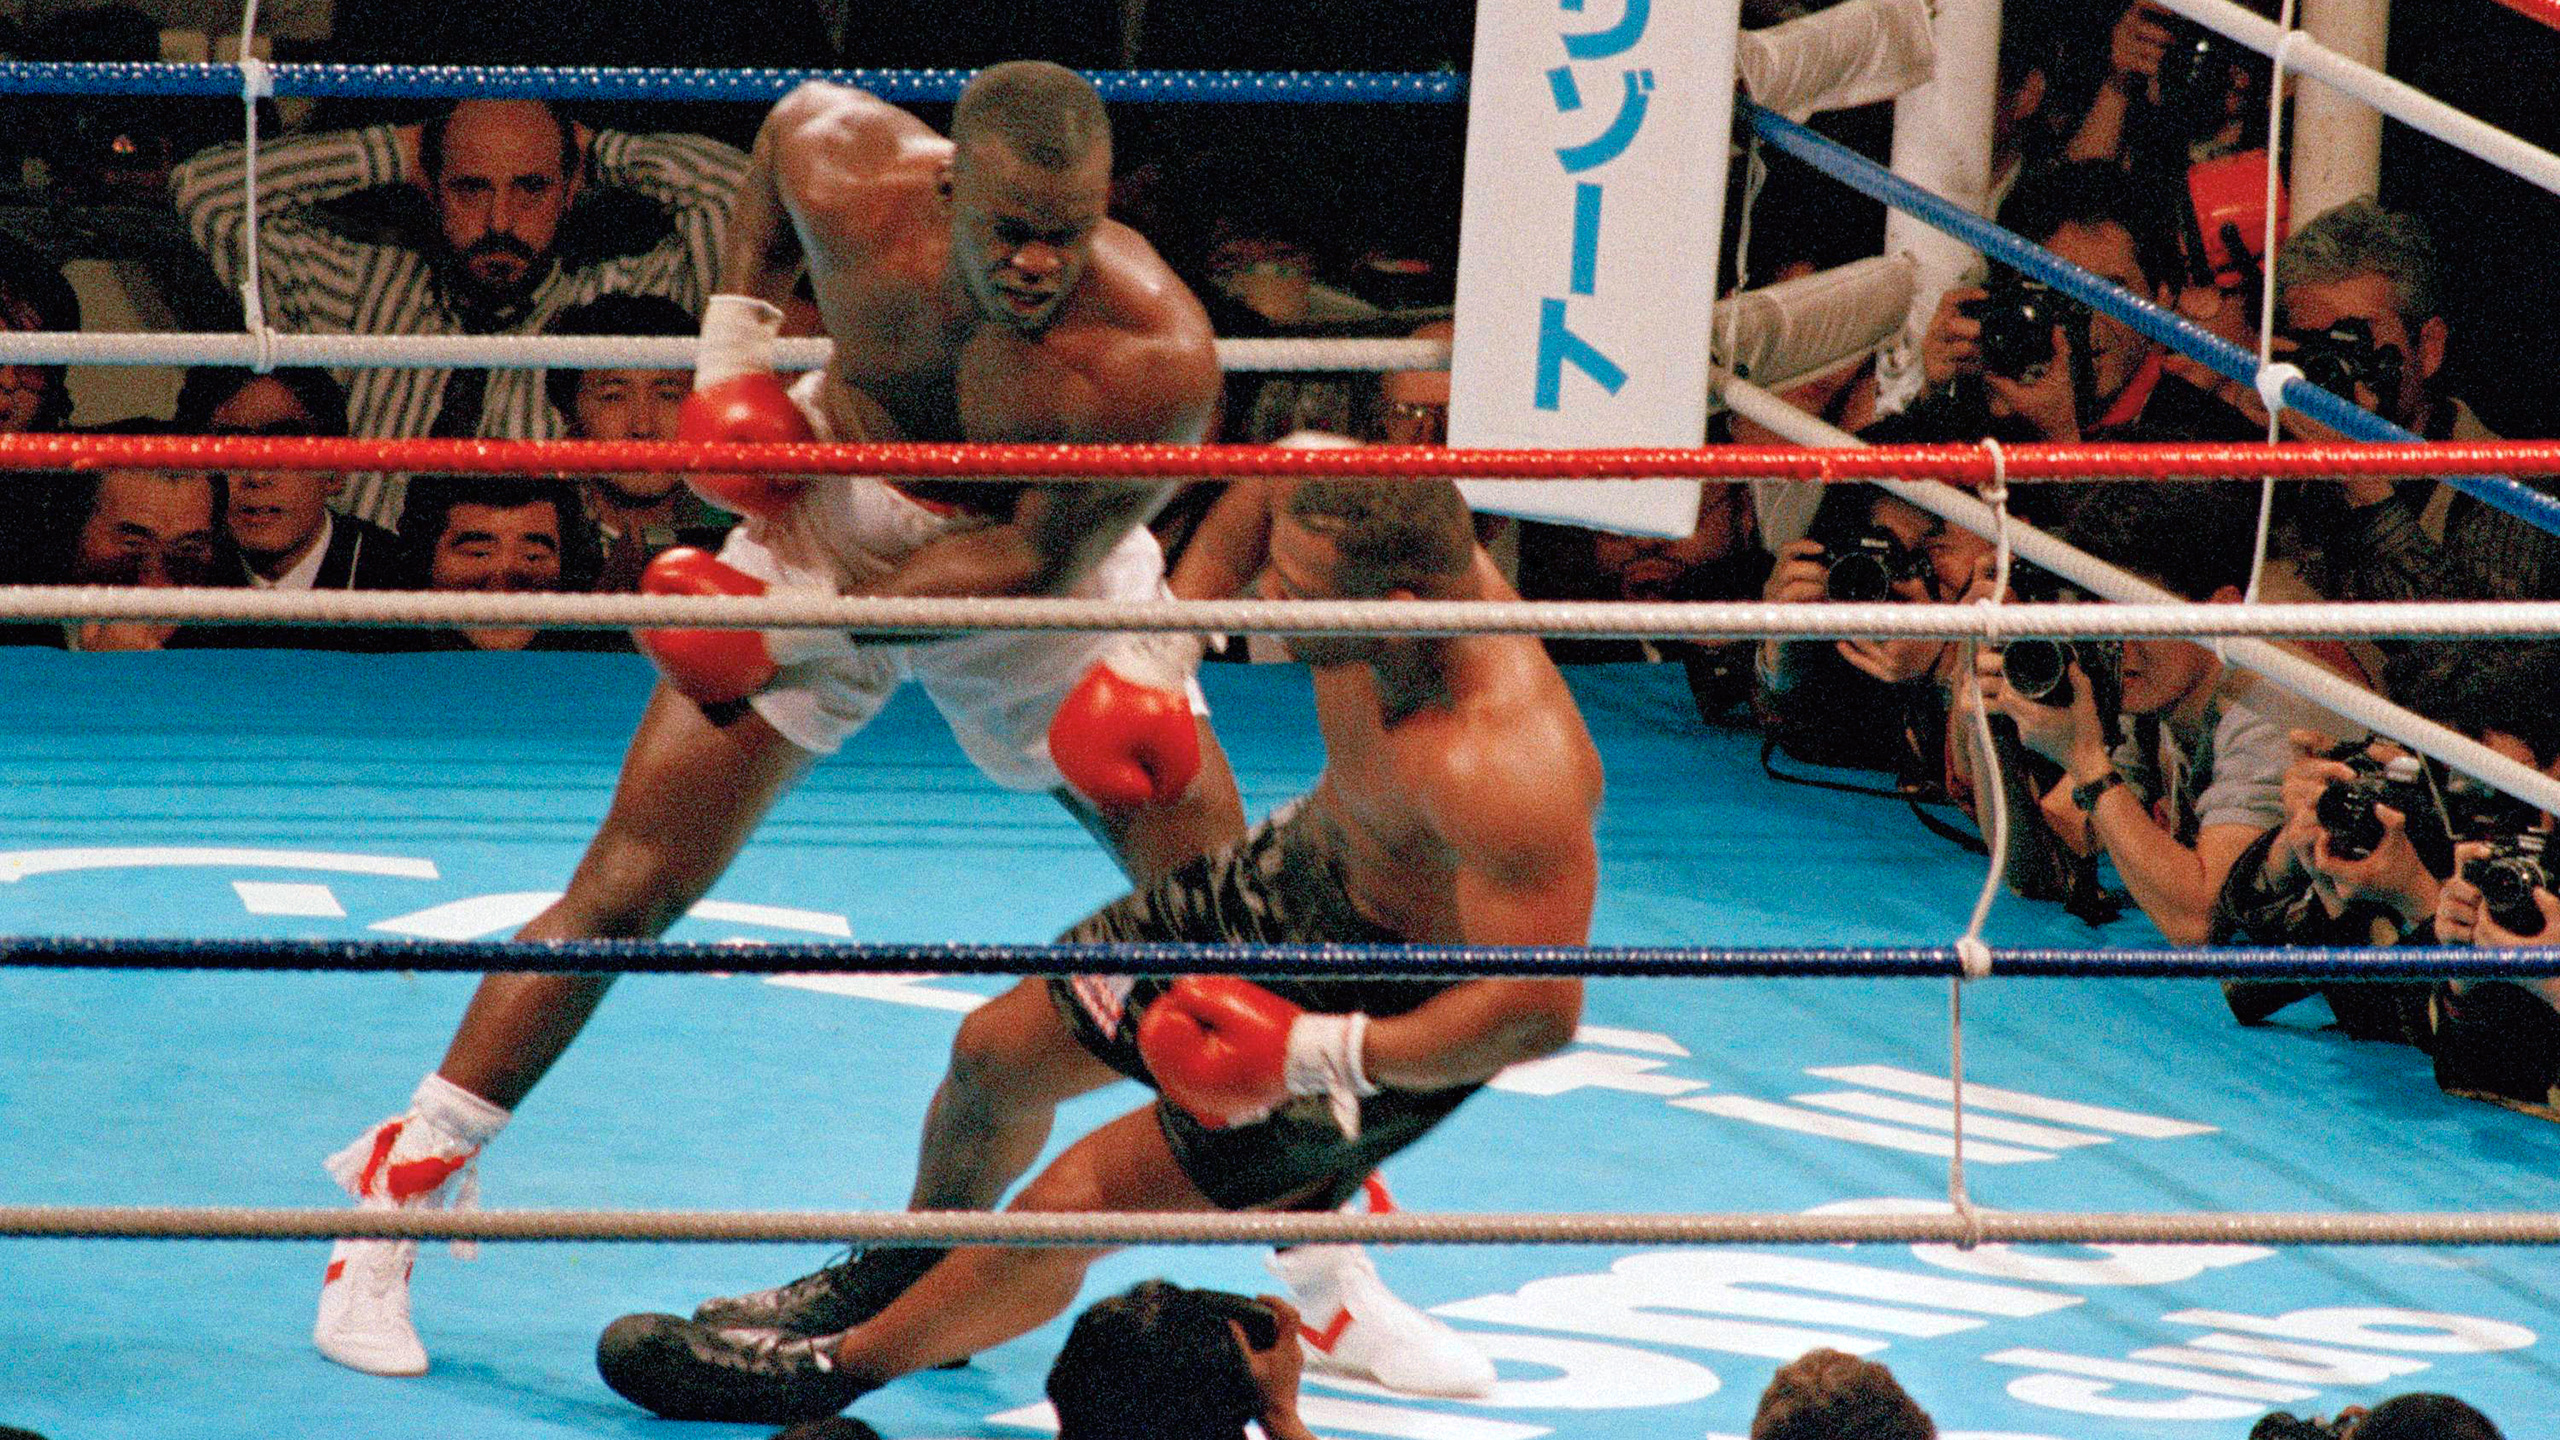 Buster Douglas vs. Mike Tyson (re-air)